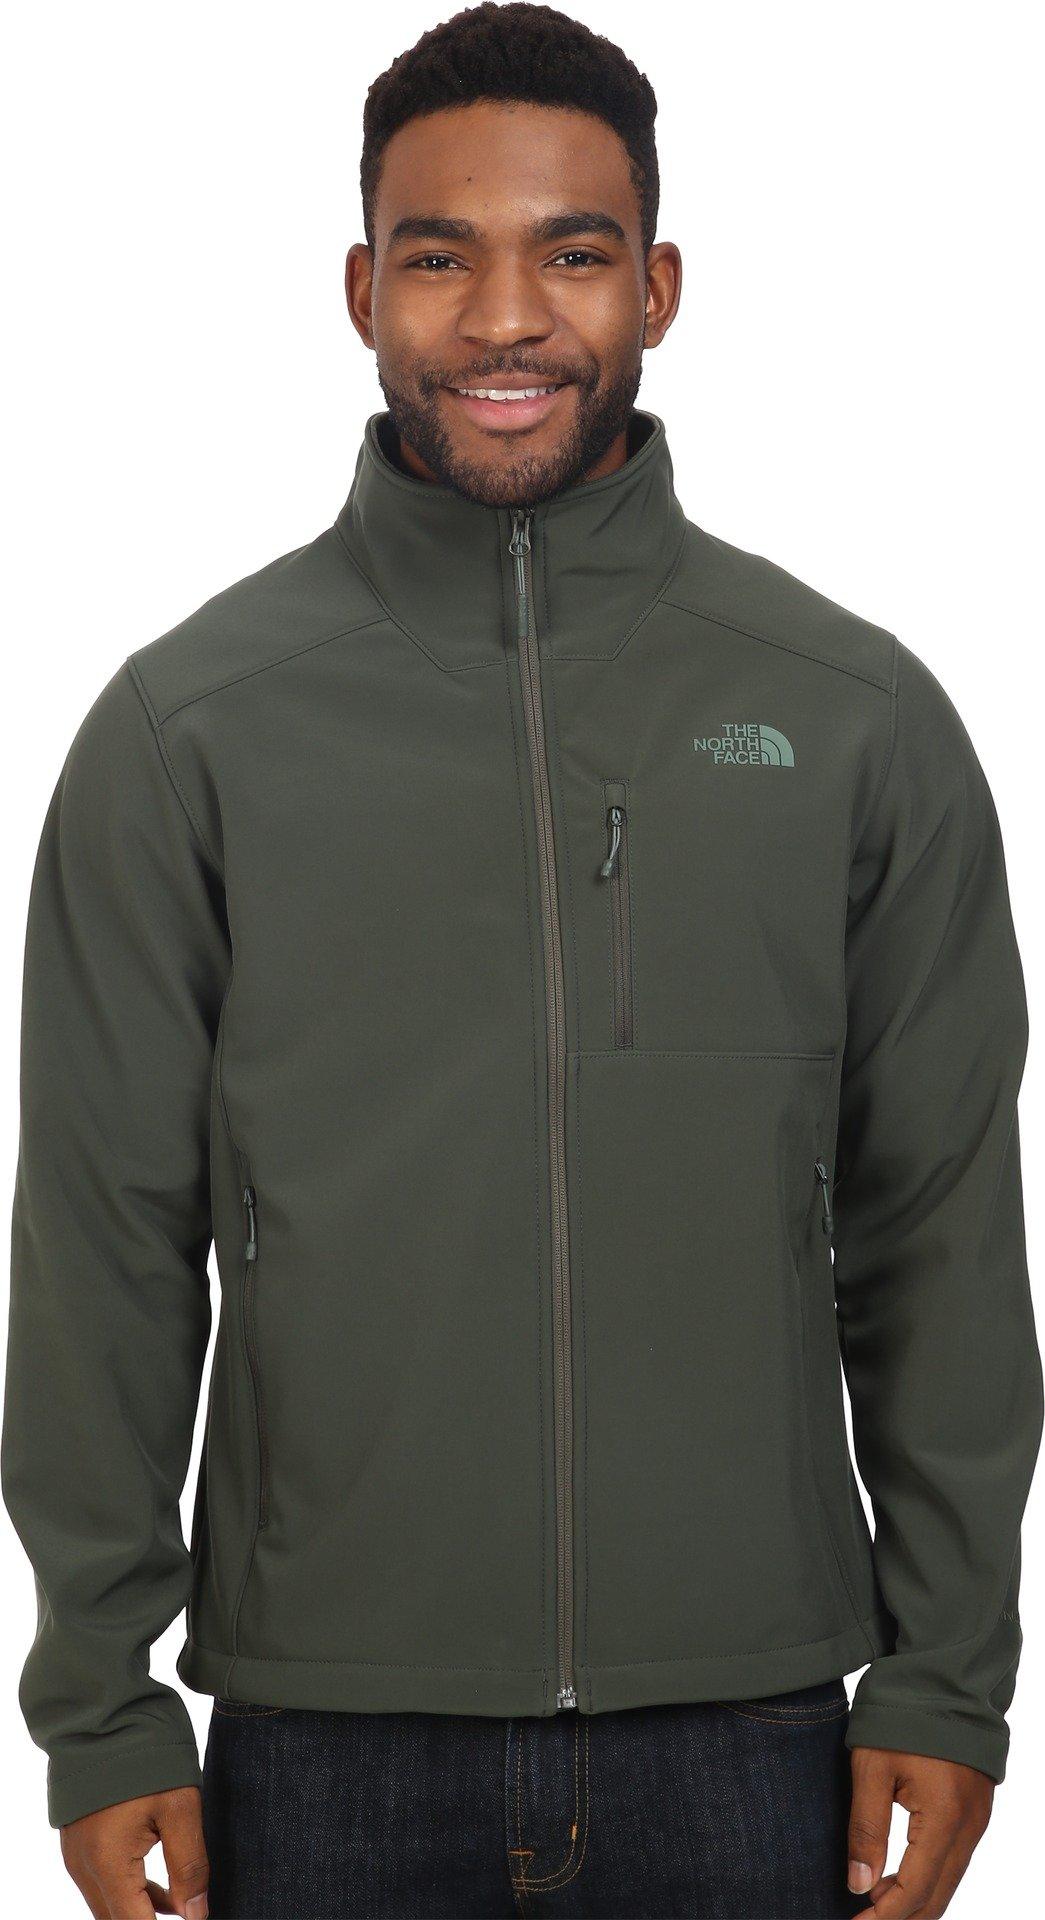 The North Face Men's Apex Bionic 2 Jacket Climbing Ivy Green/Climbing Ivy Green (Prior Season) Large